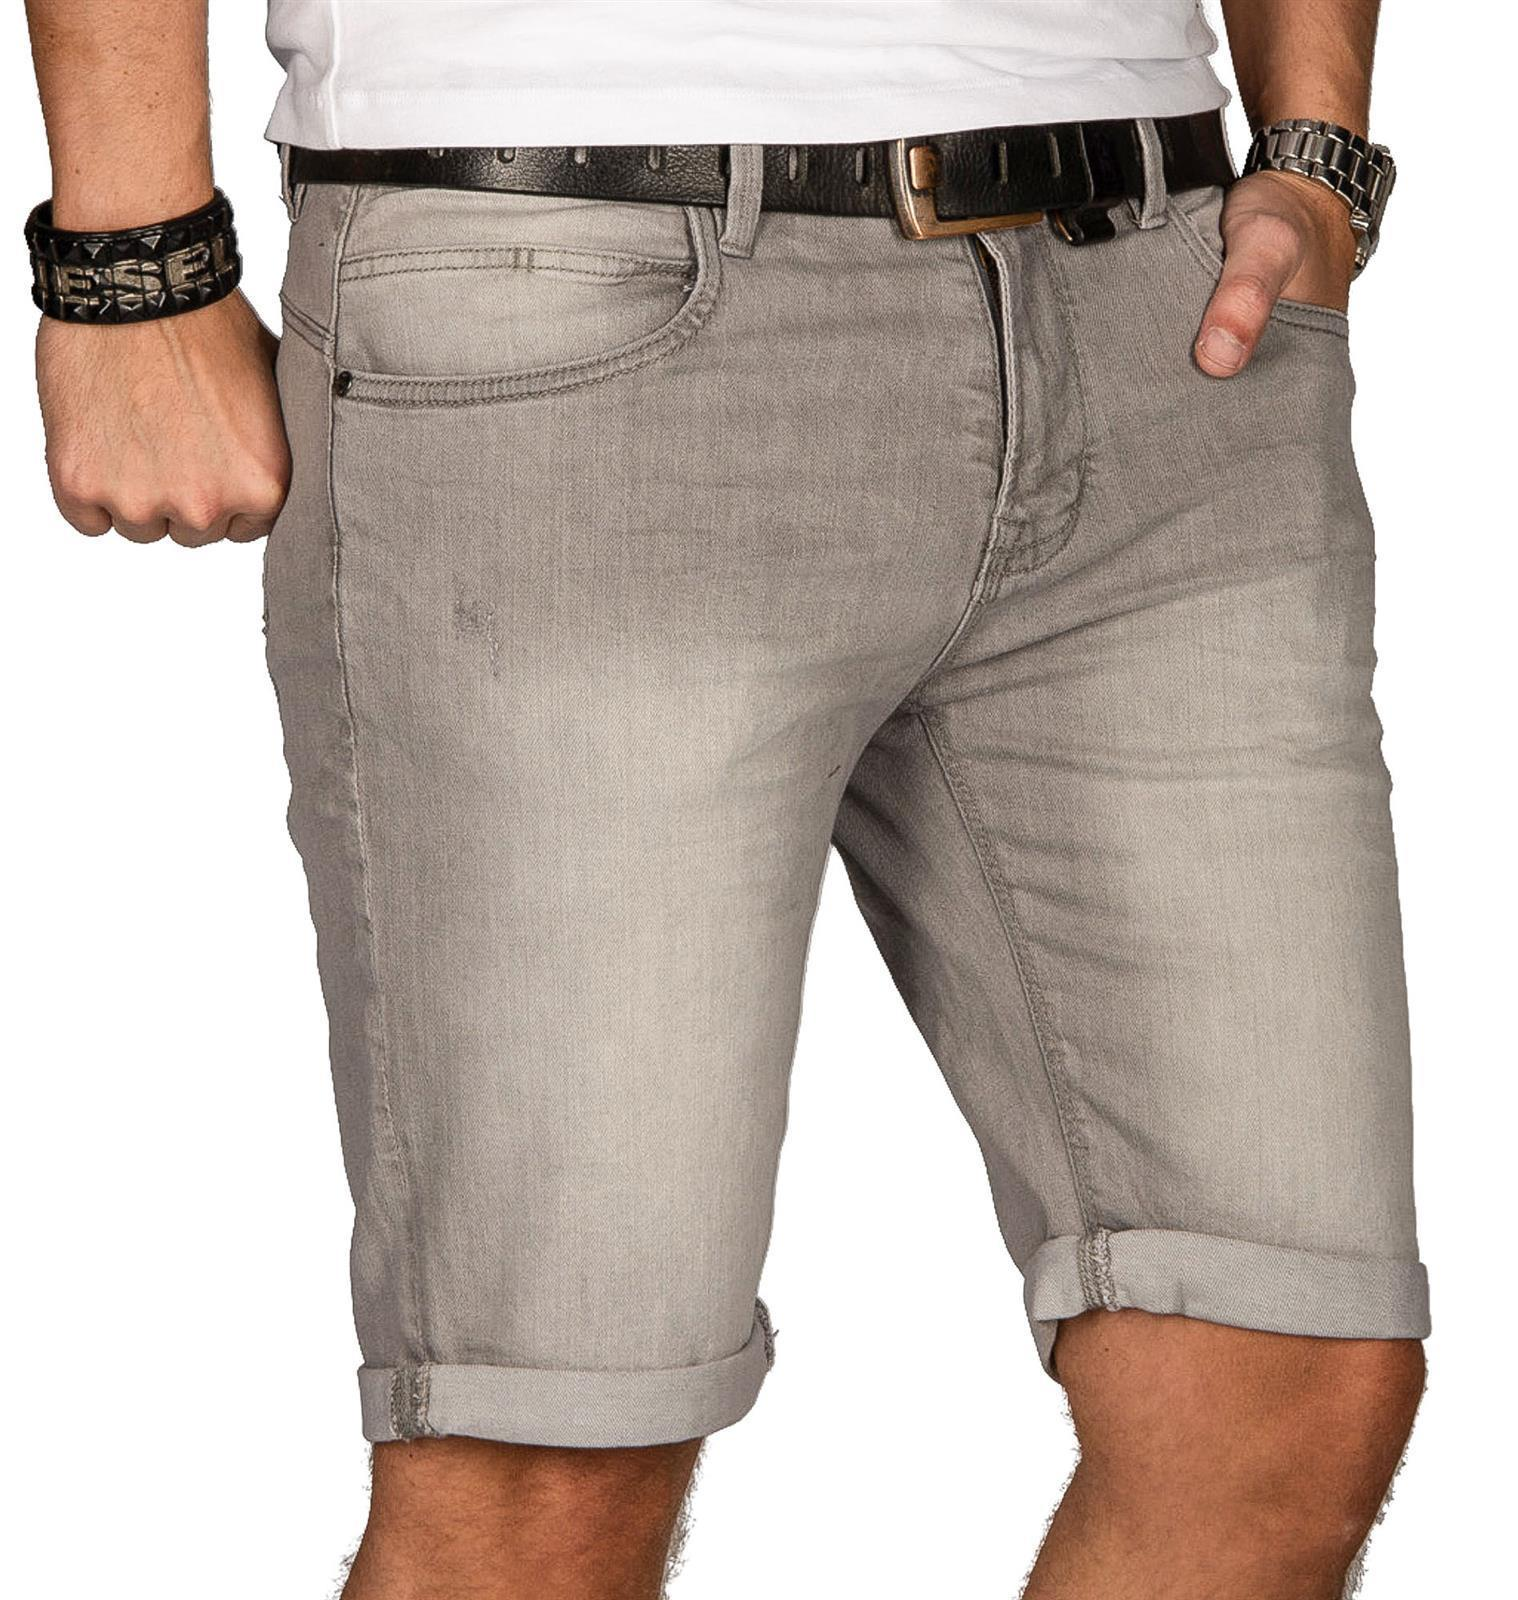 Indicode-Herren-Sommer-Bermuda-Jeans-Shorts-kurze-Hose-Sommerhose-Short-Neu-B556 Indexbild 19